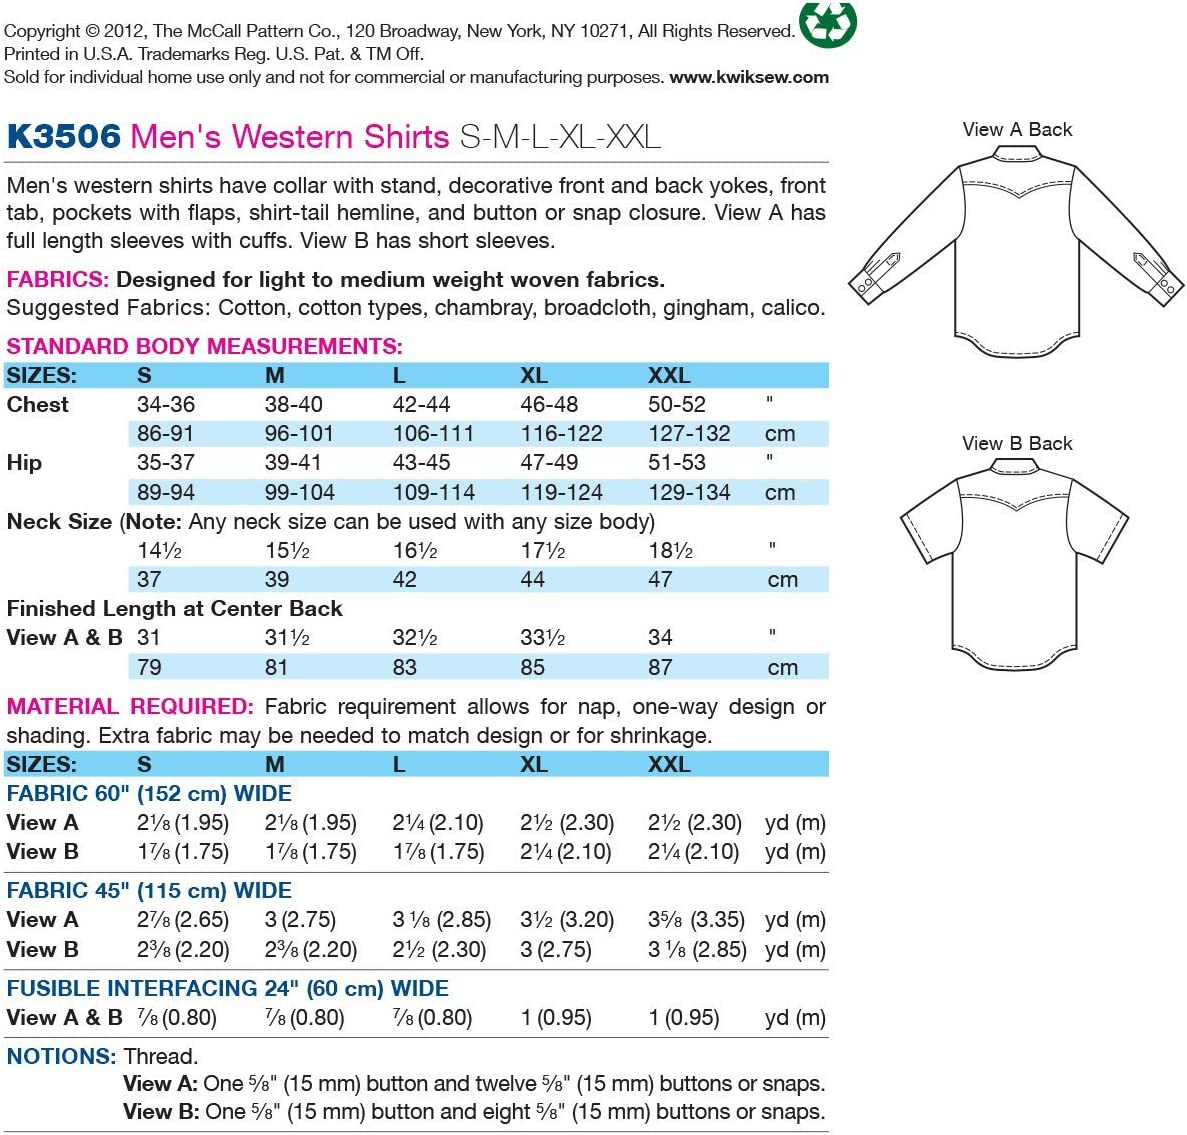 Size S-M-L-XL-XXL Kwik Sew K3506 Shirts Sewing Pattern